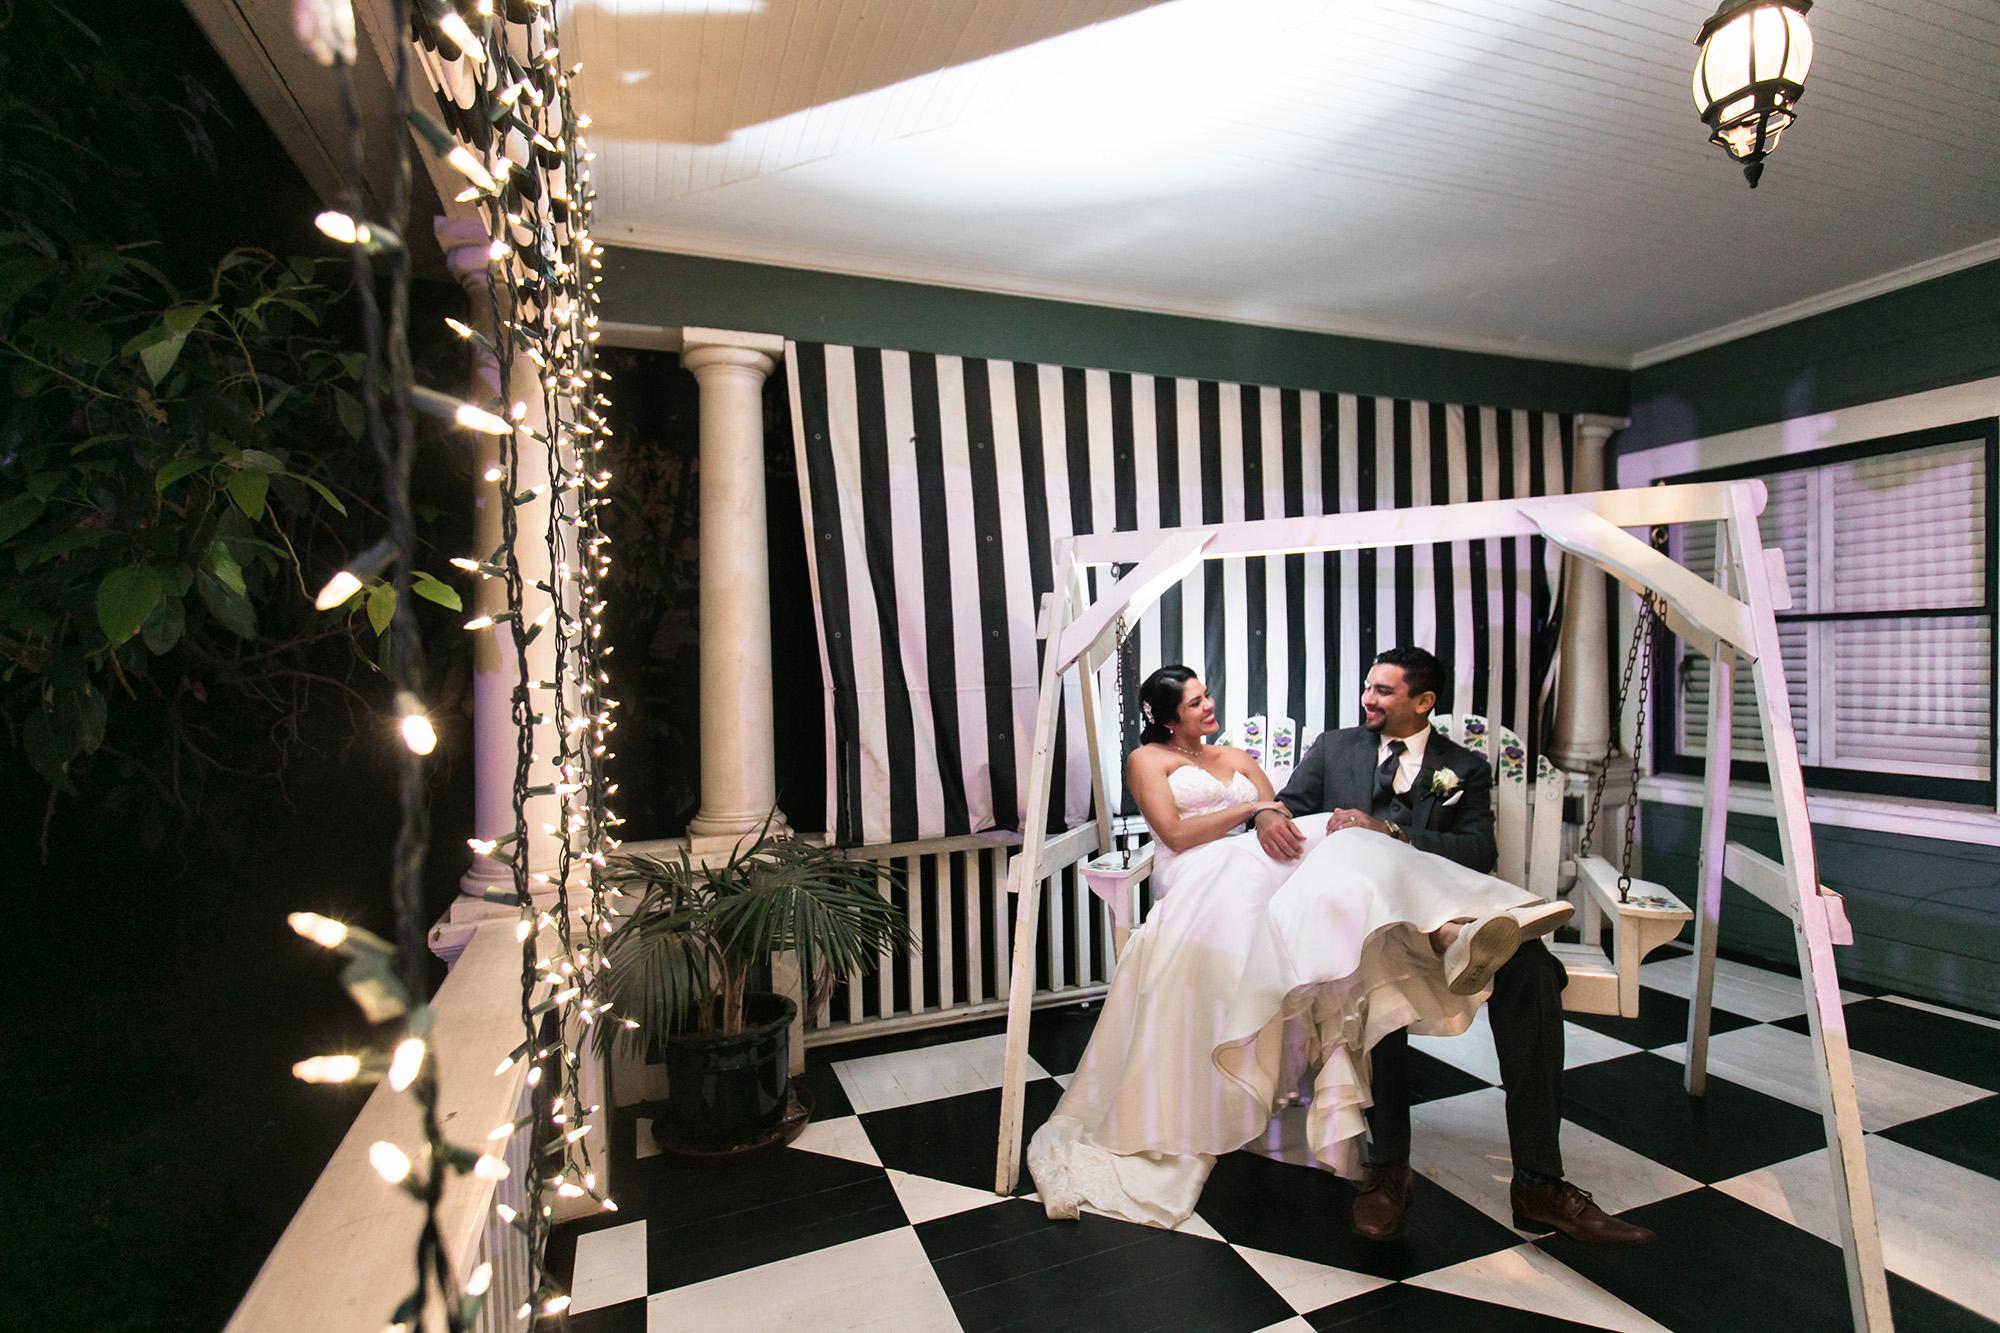 christmas-house-weddings-receptions-carrie-vines-038.jpg